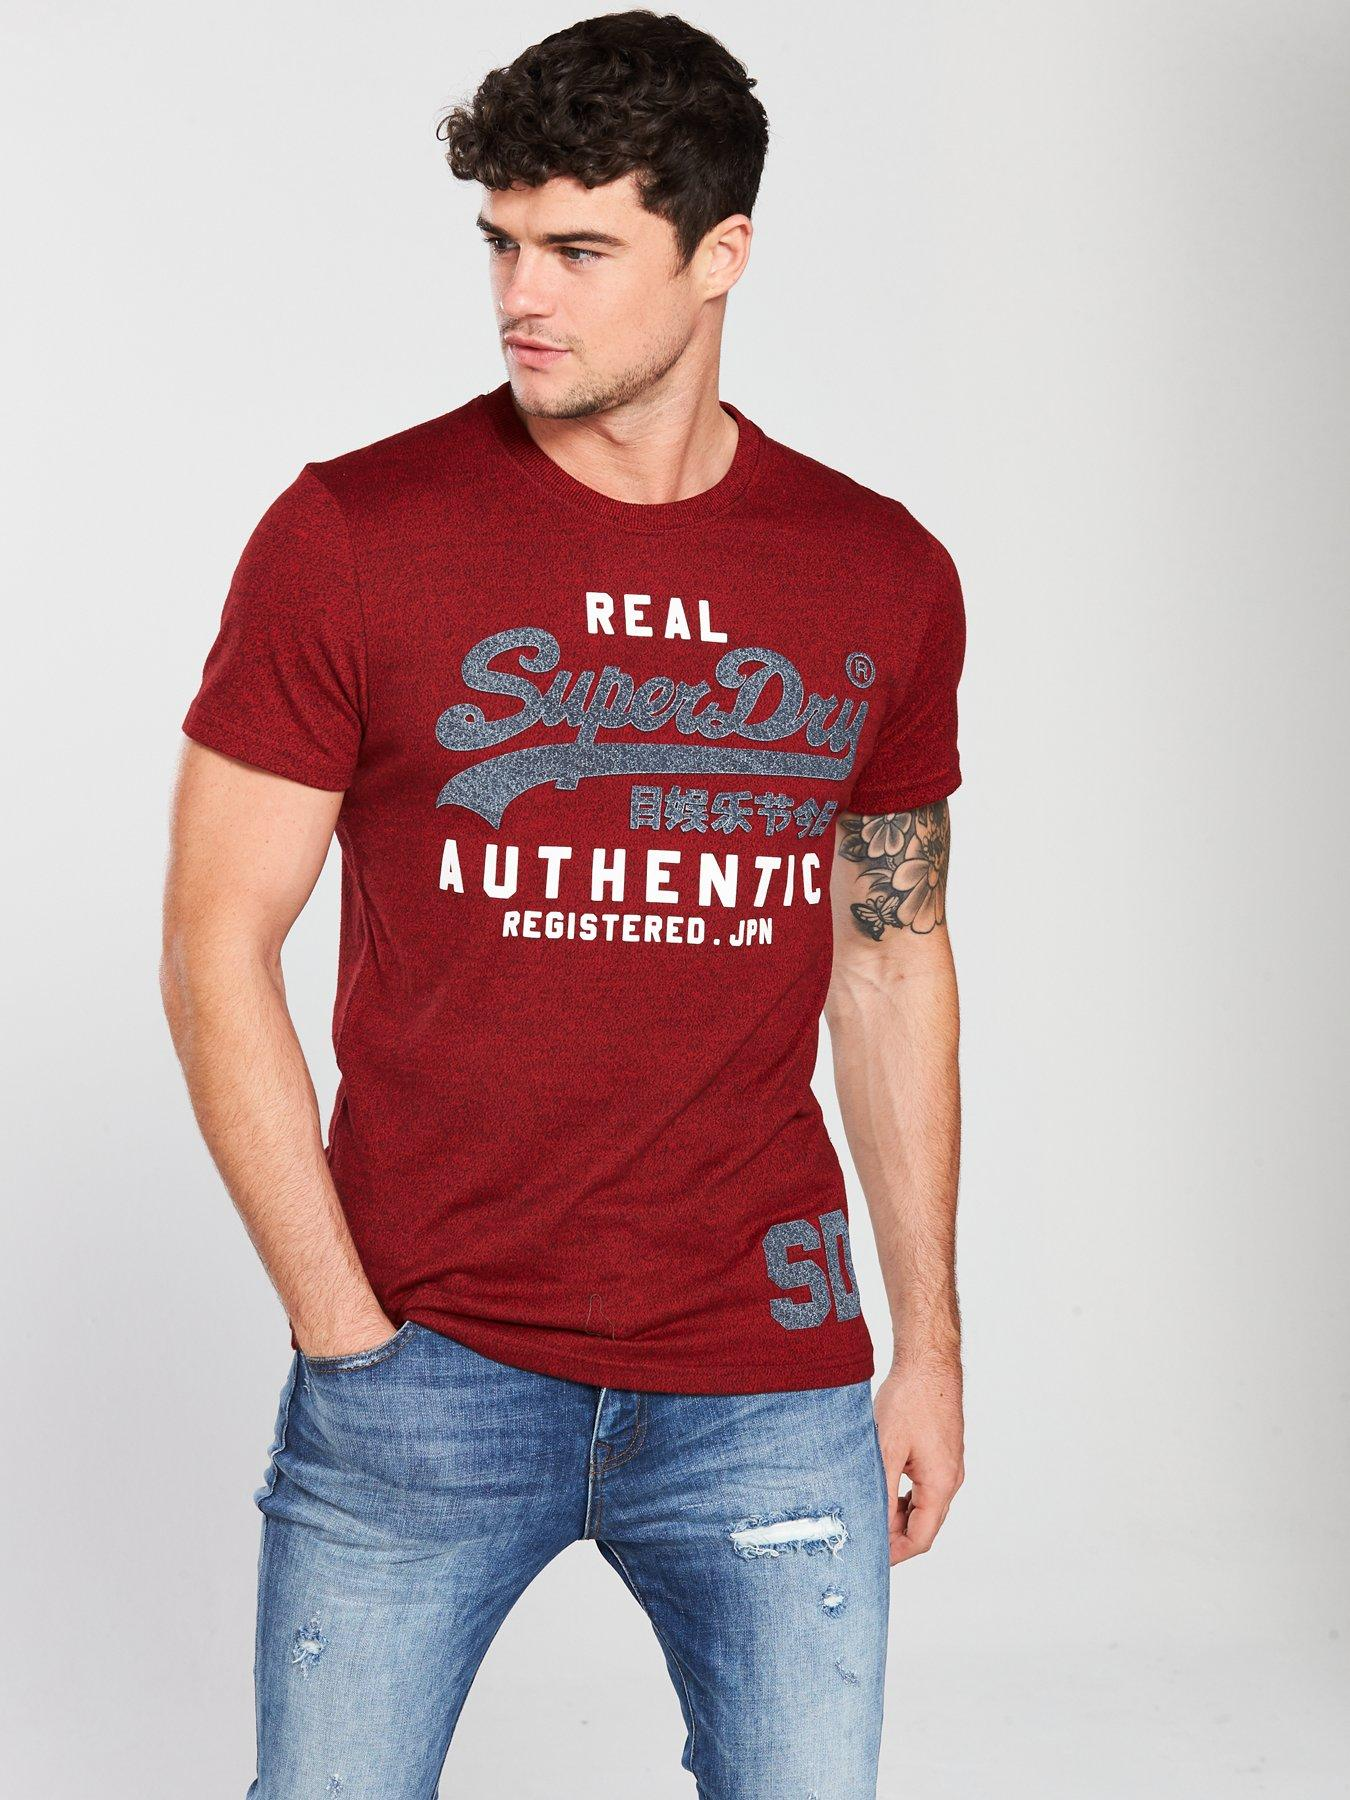 acb7682b8ba30 Men's Online Littlewoods Superdry Sportswear Ireland 4d1HOwOq